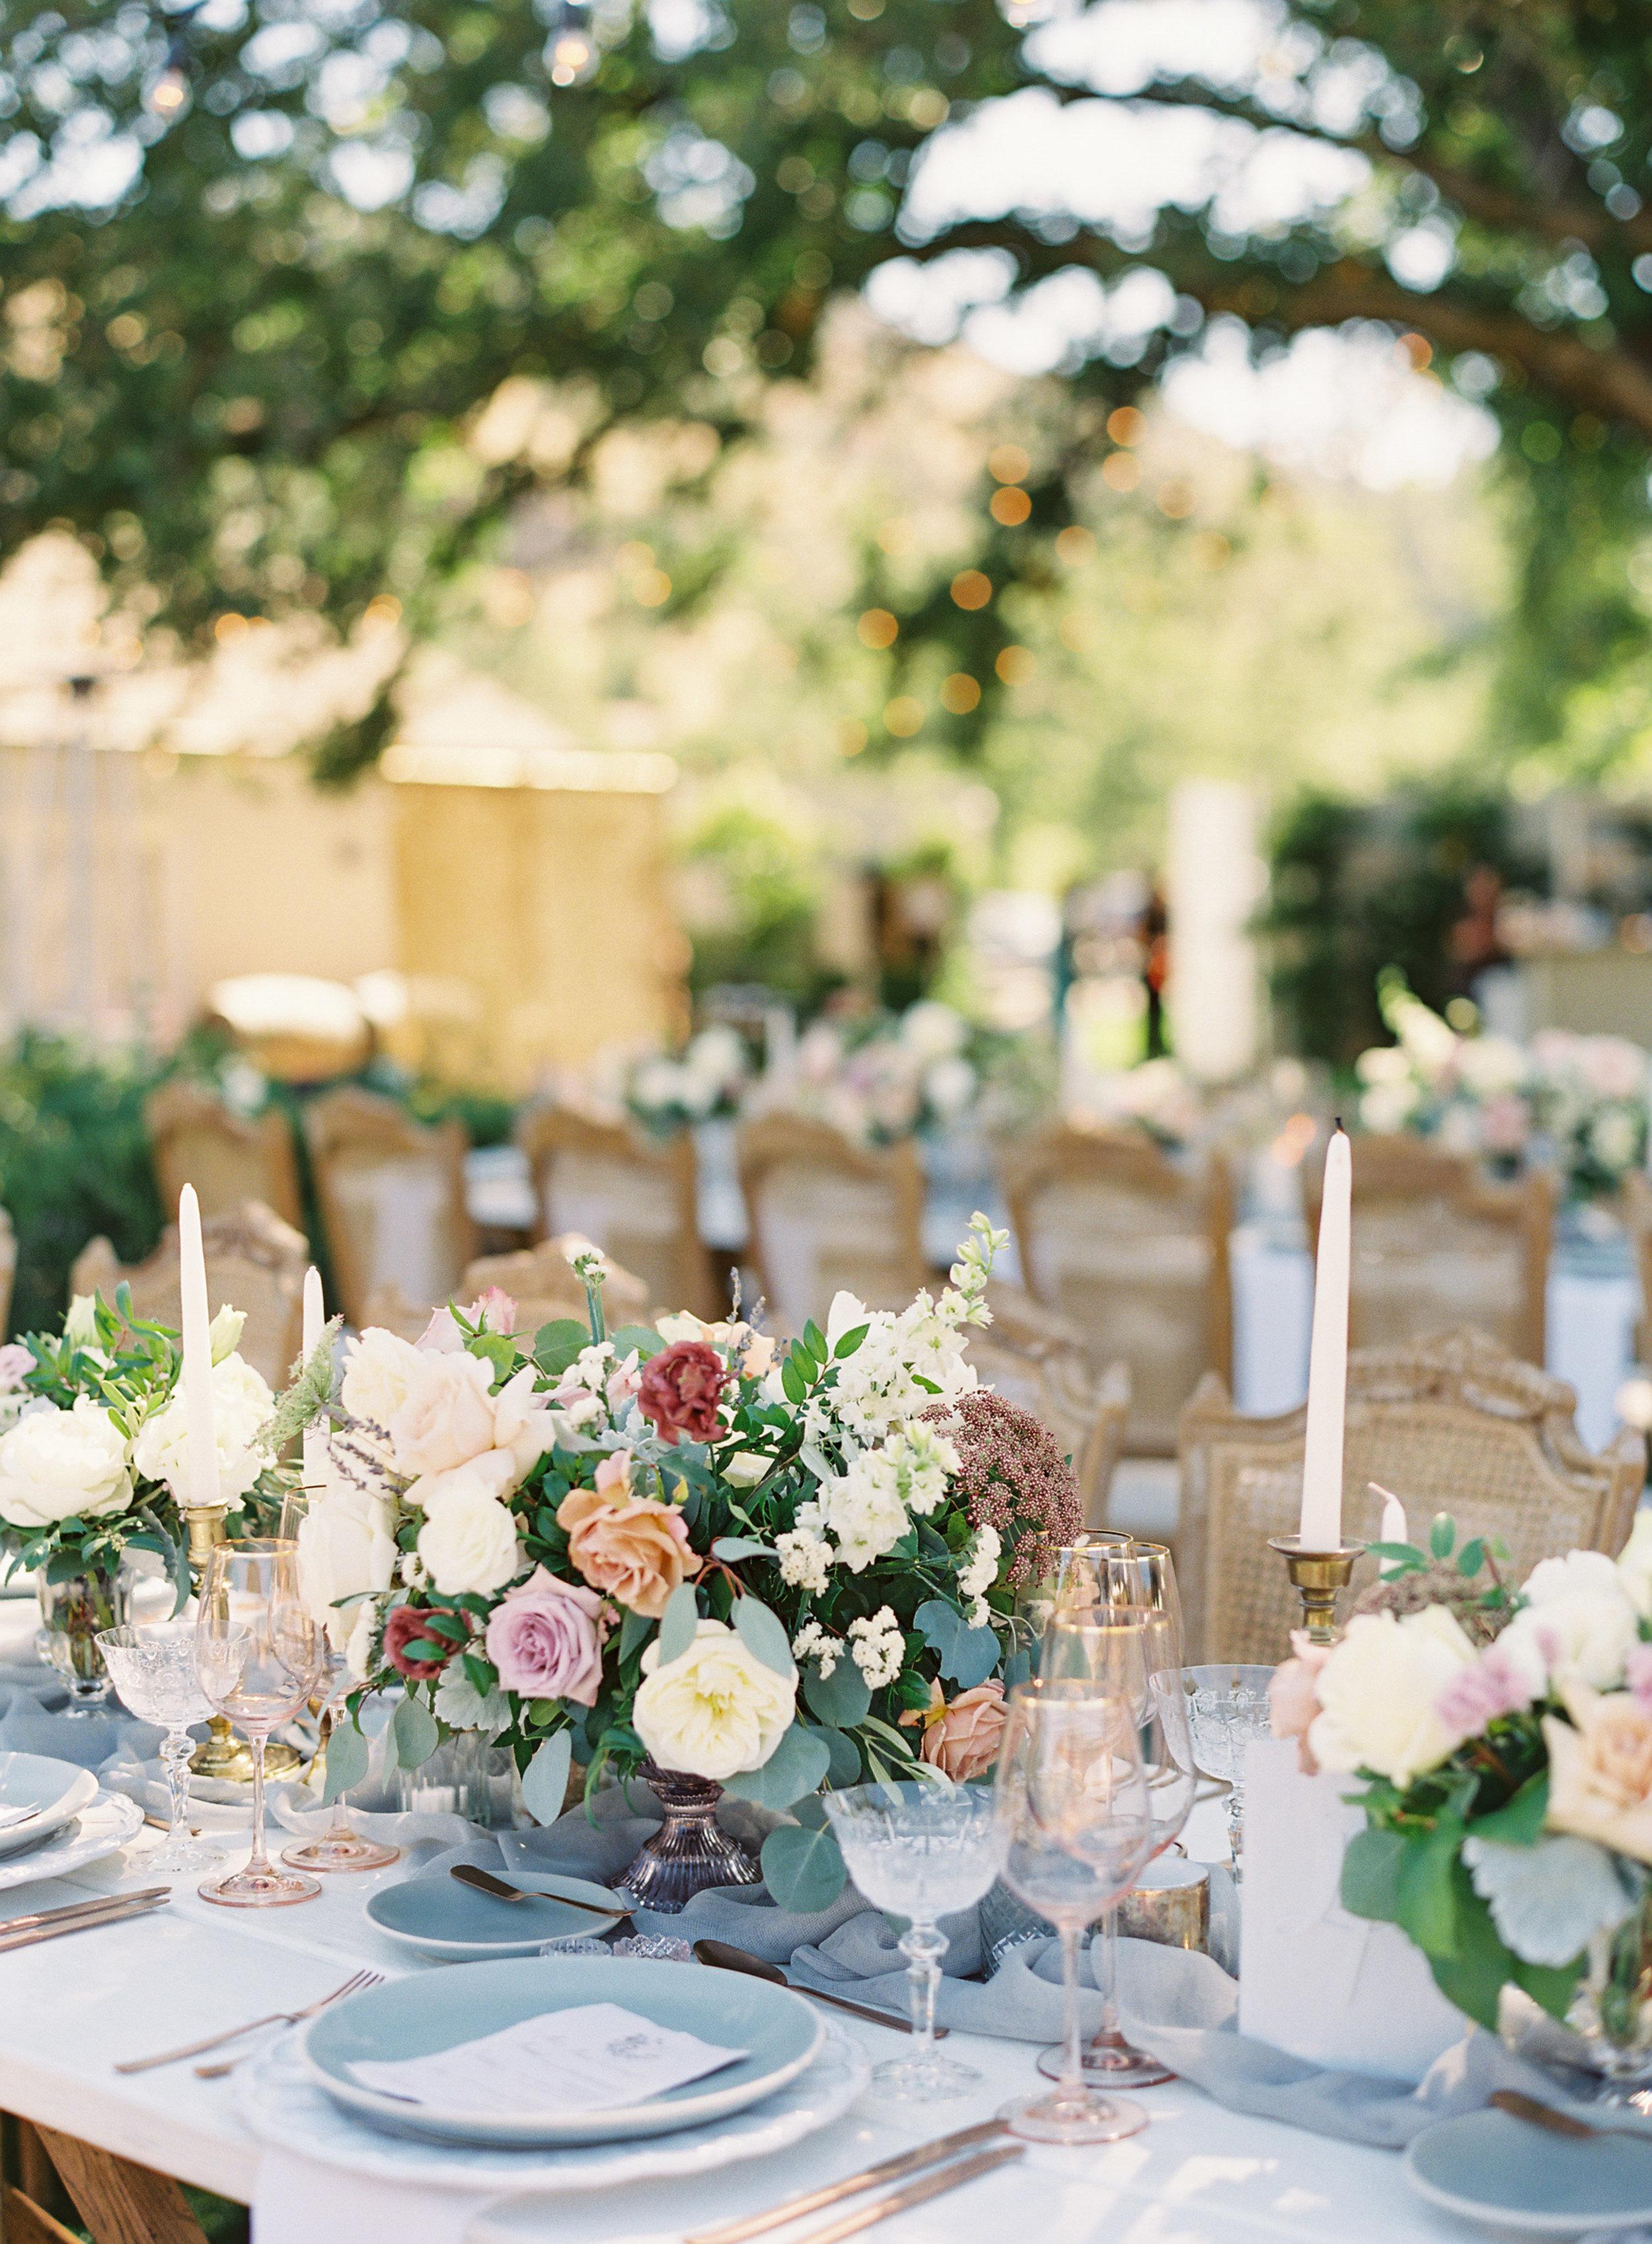 Triunfo_Creek_Winery_Wedding-214-Jen-Huang-JL-449-Jen-Huang-009972-R1-013.jpg